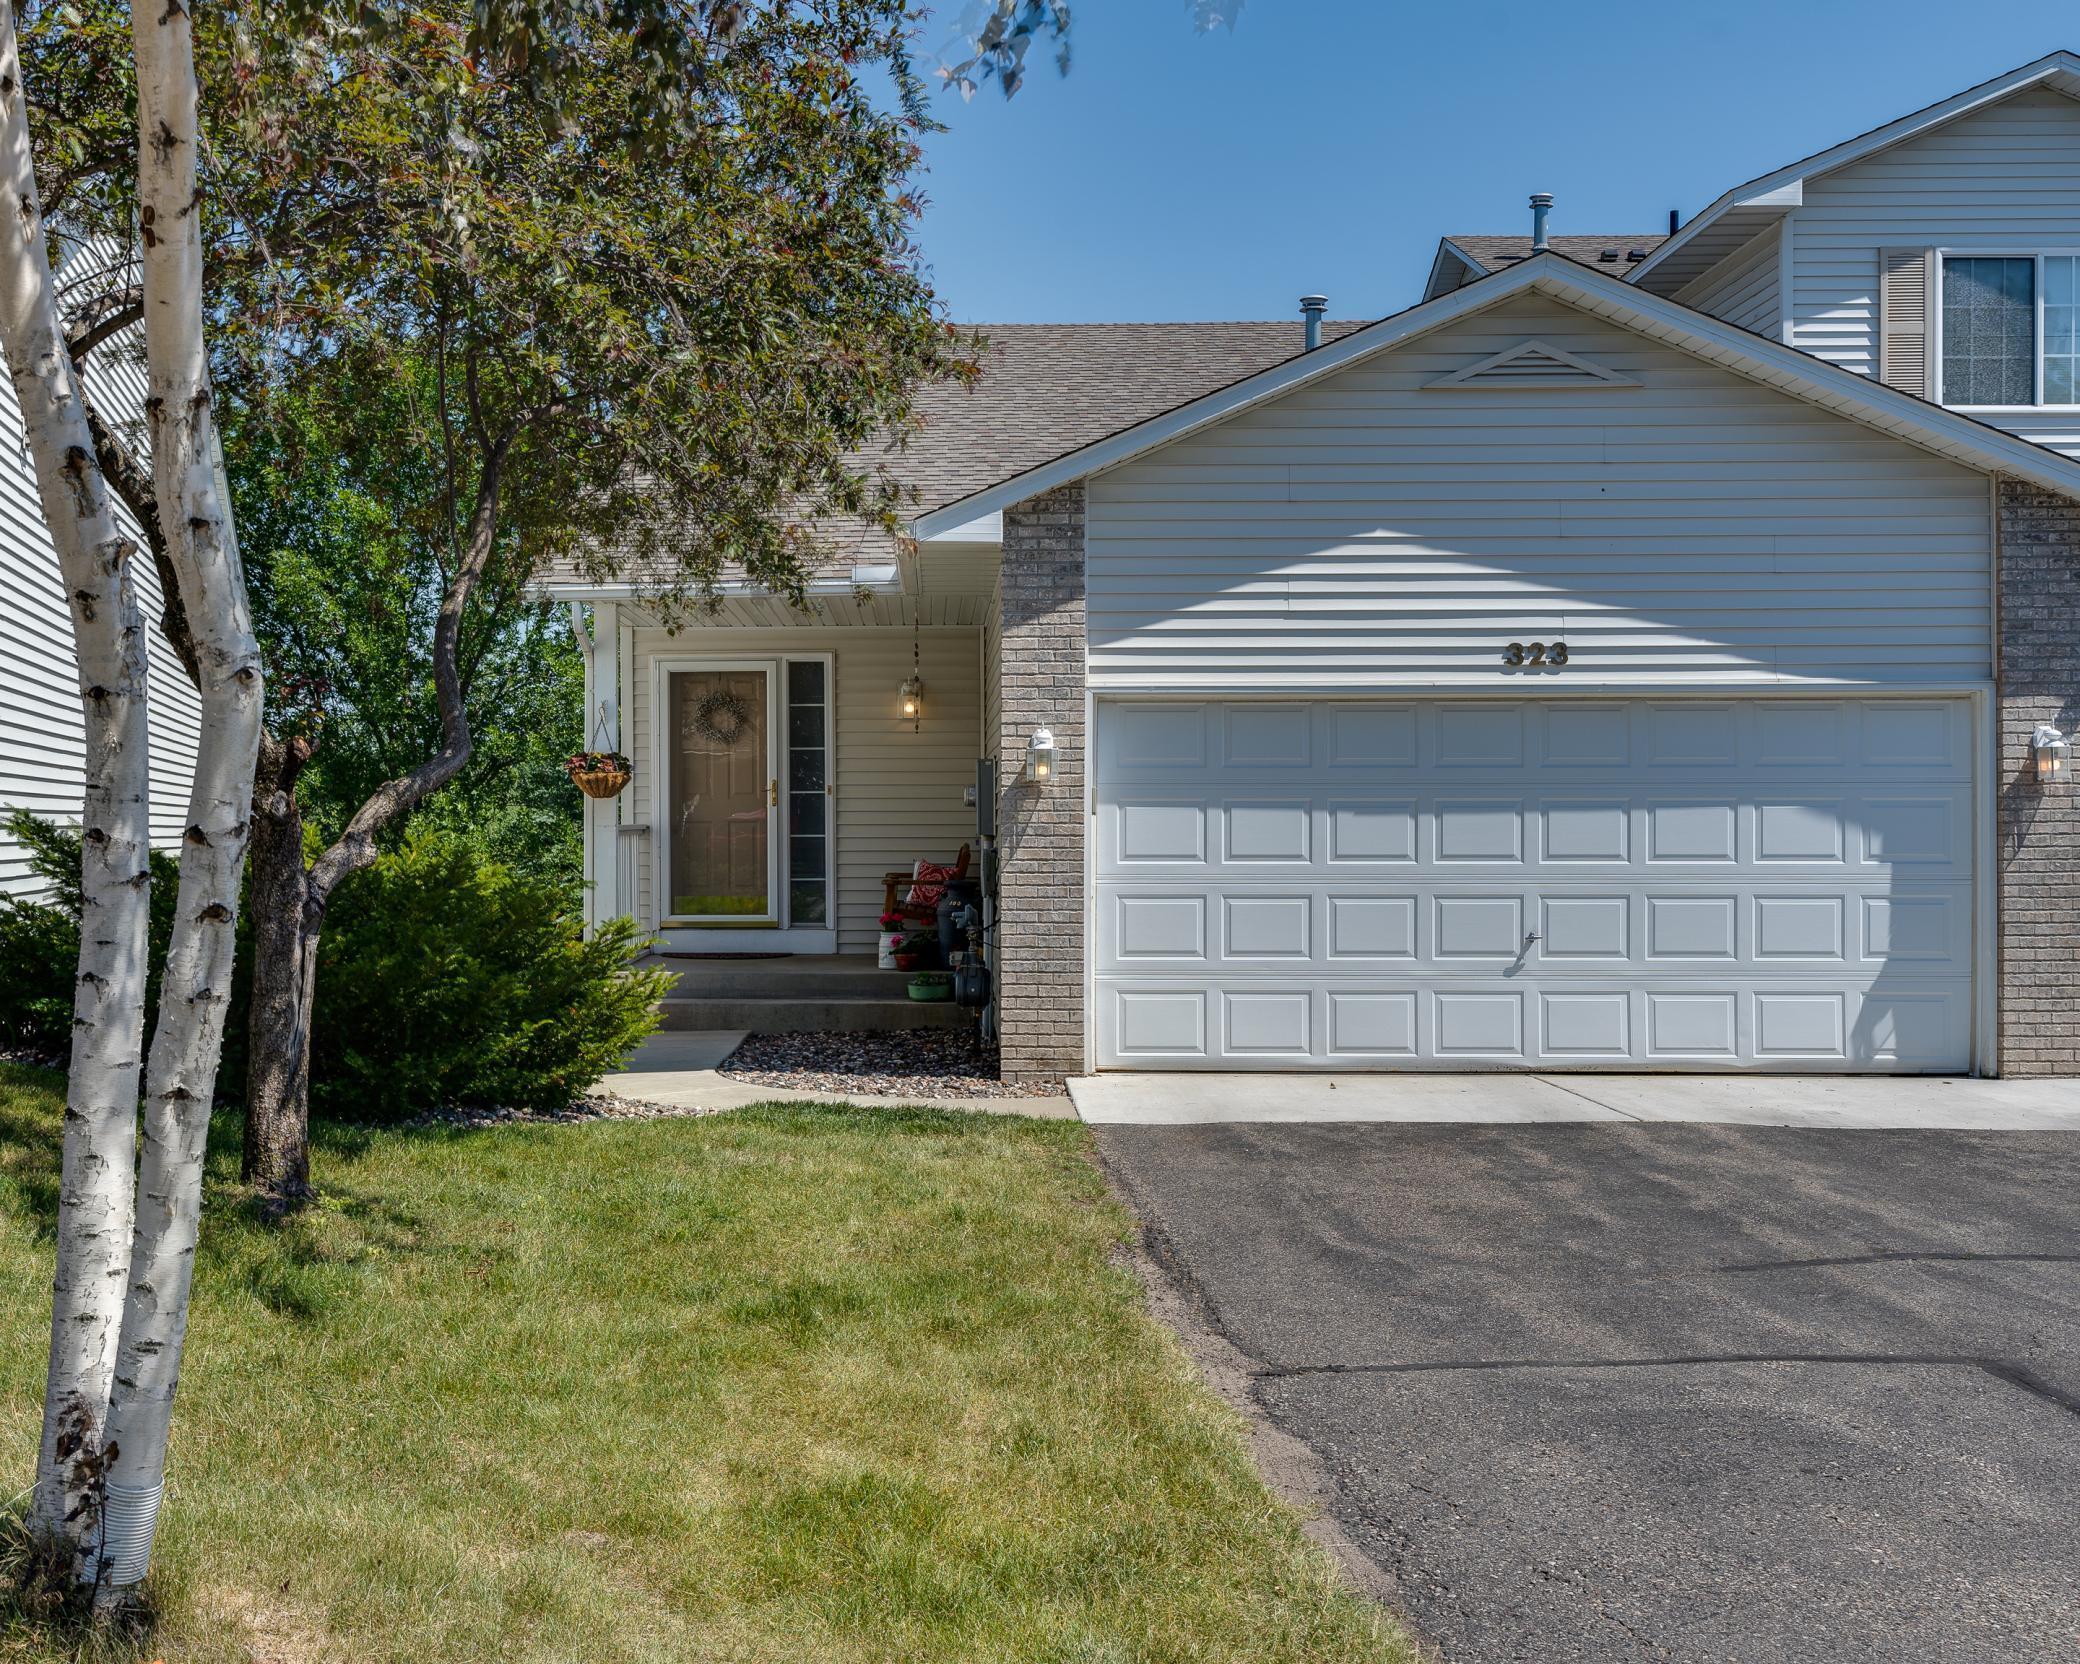 323 Archibald Property Photo - Dundas, MN real estate listing